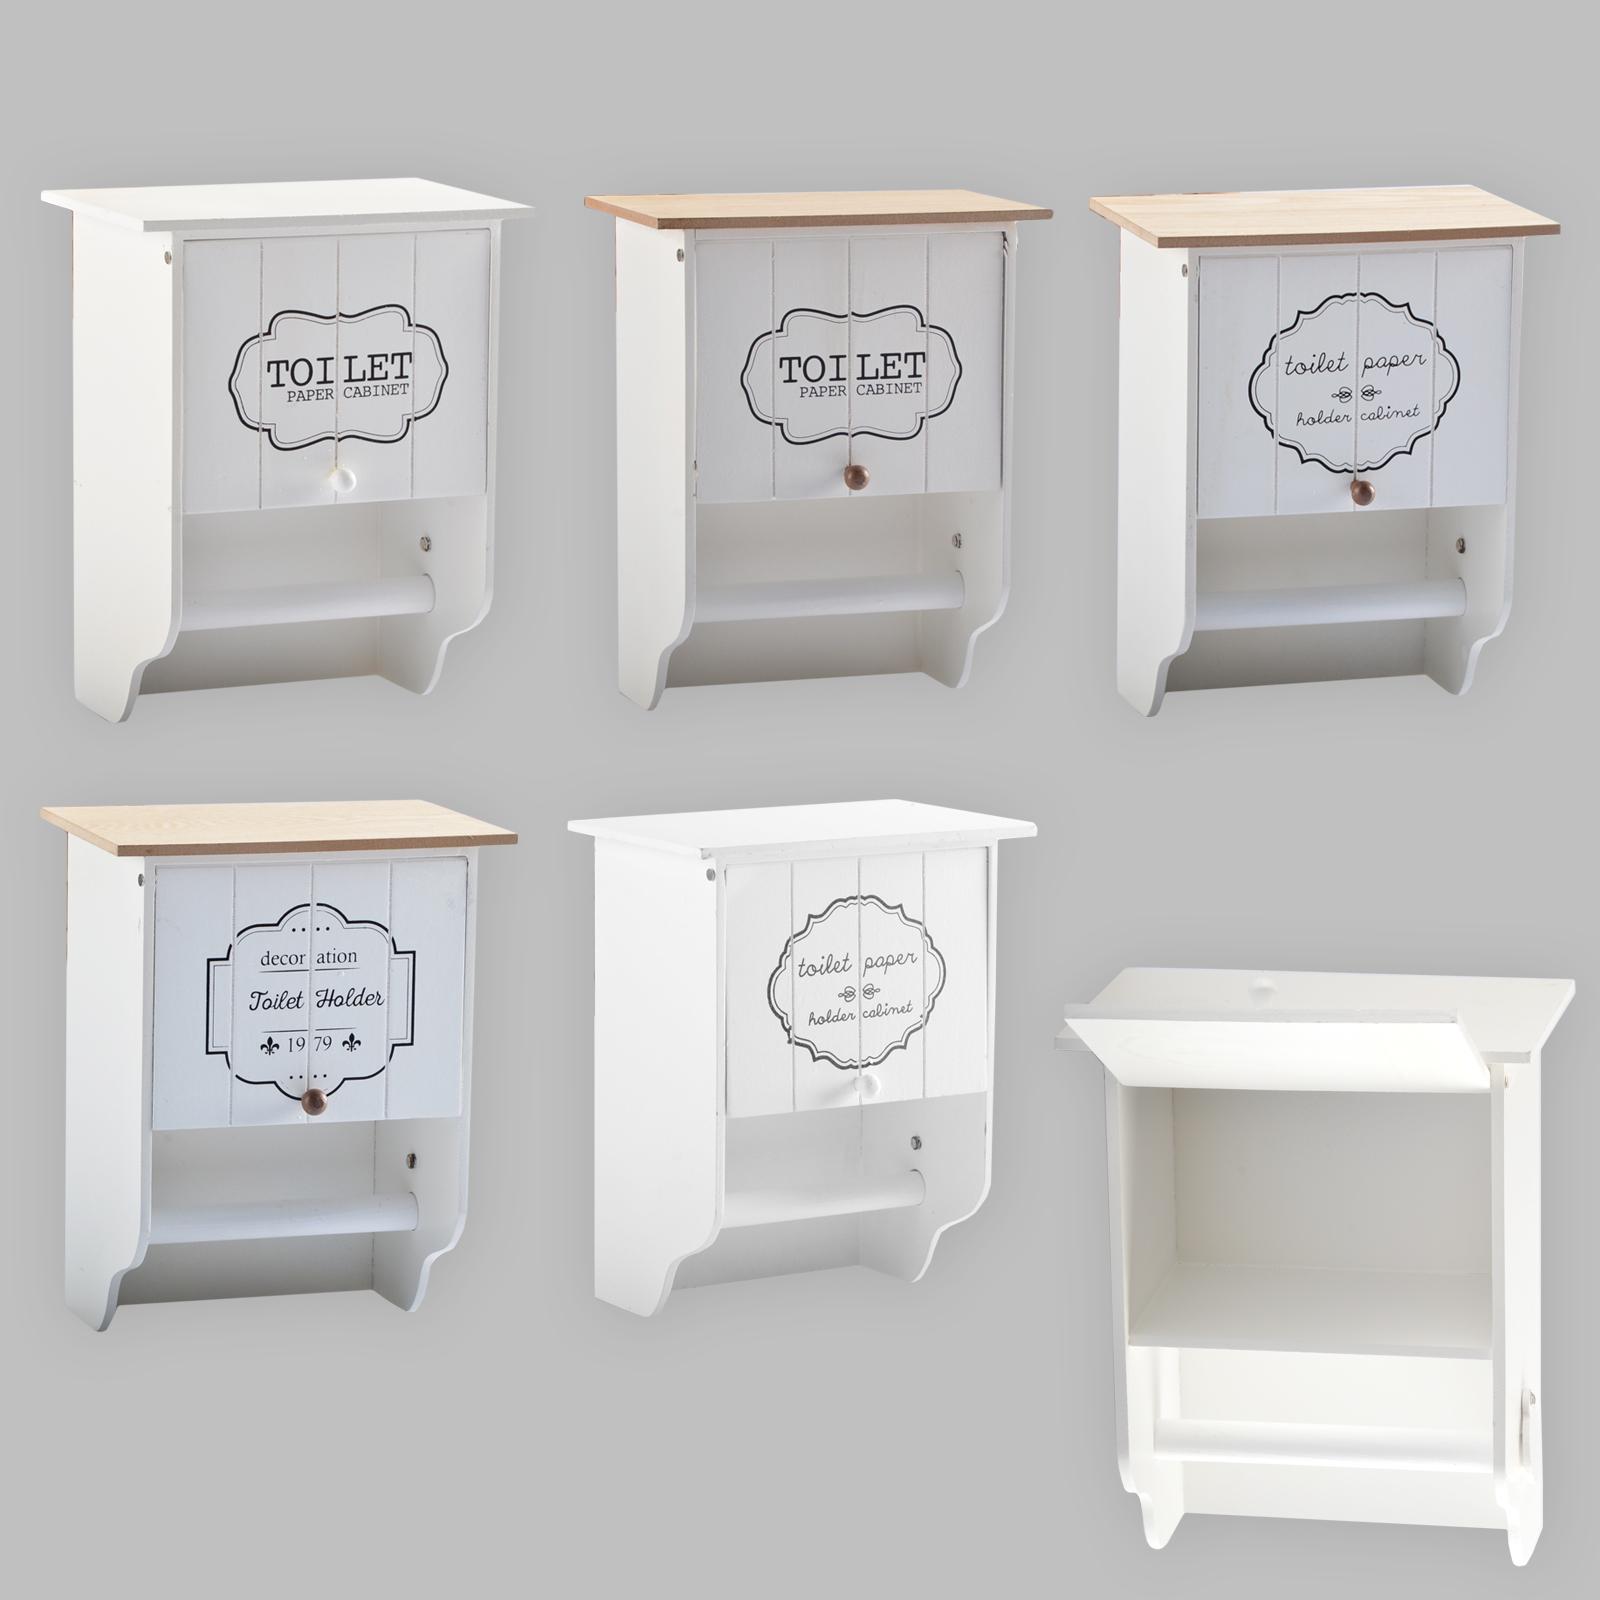 toilettenpapierhalter klopapierhalter rollenhalter shabby chic landhaus holz ebay. Black Bedroom Furniture Sets. Home Design Ideas